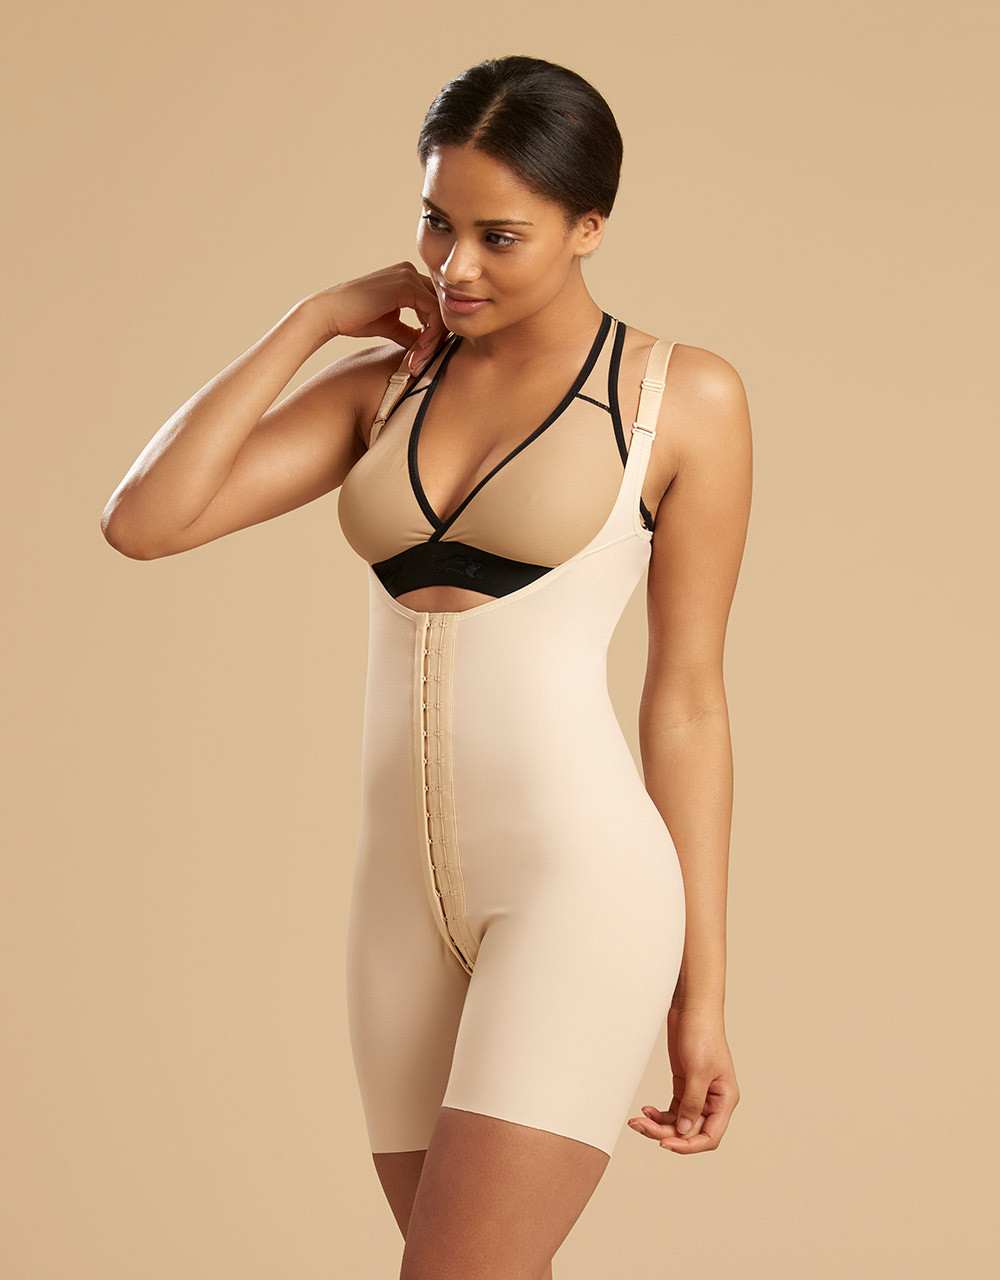 aca62b25ea SFBHT | Compression Bodysuit Mid Thigh Length - Marena Group